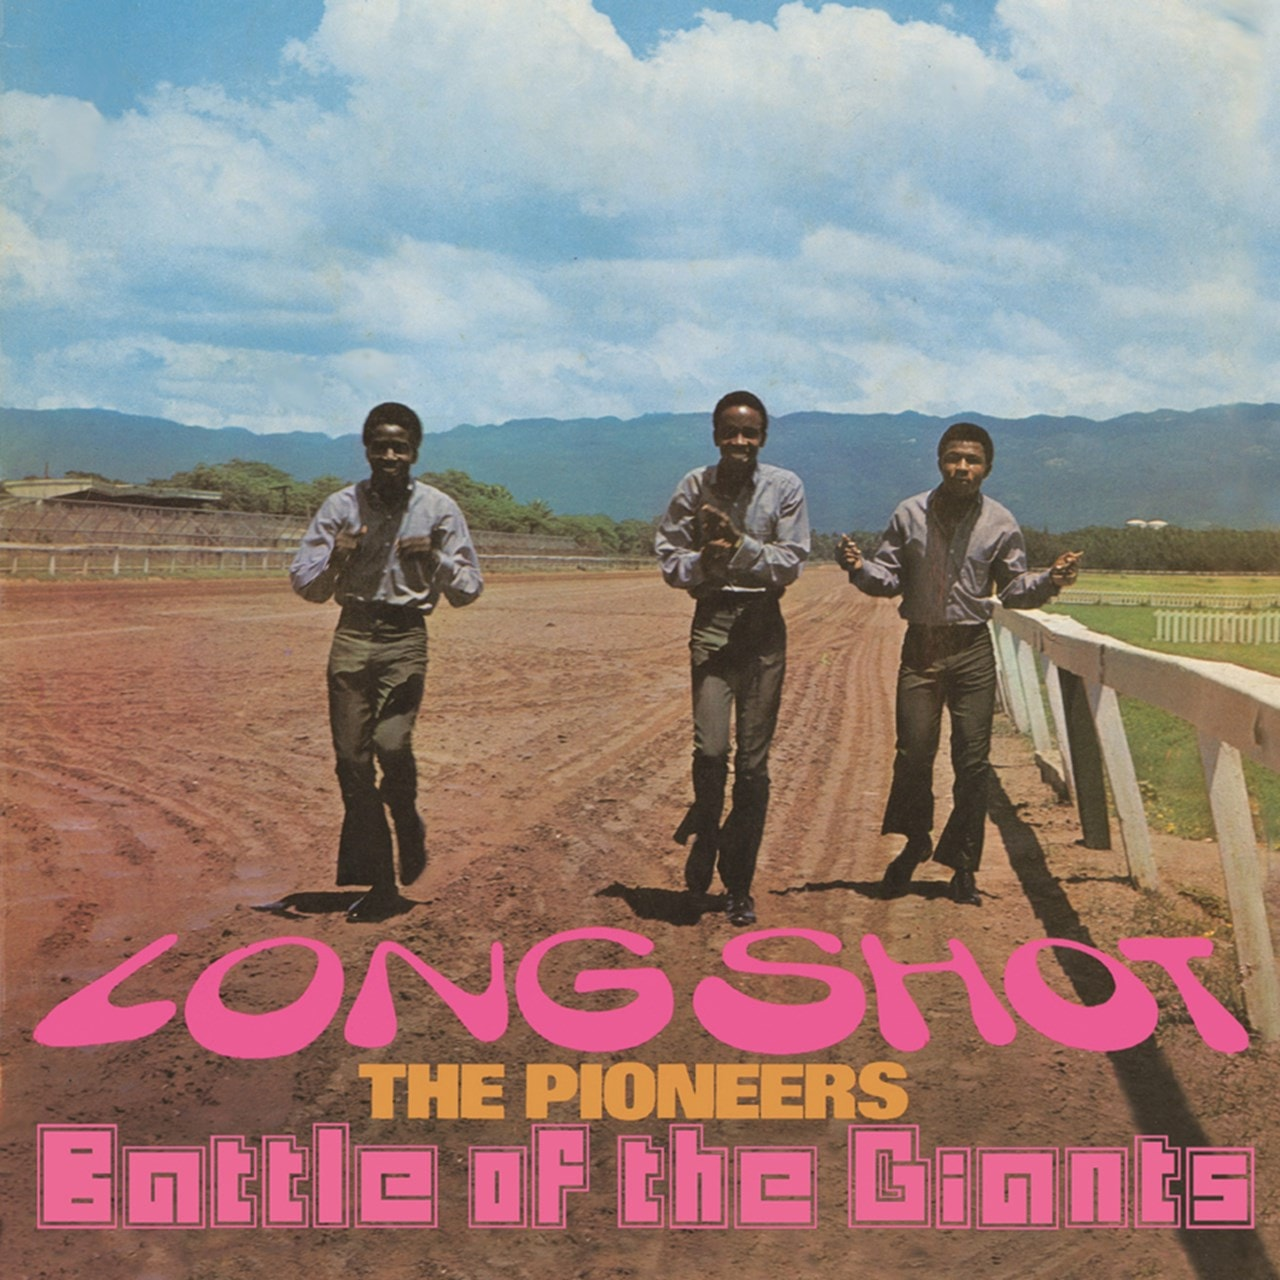 Long Shot/Battle of the Giants - 1